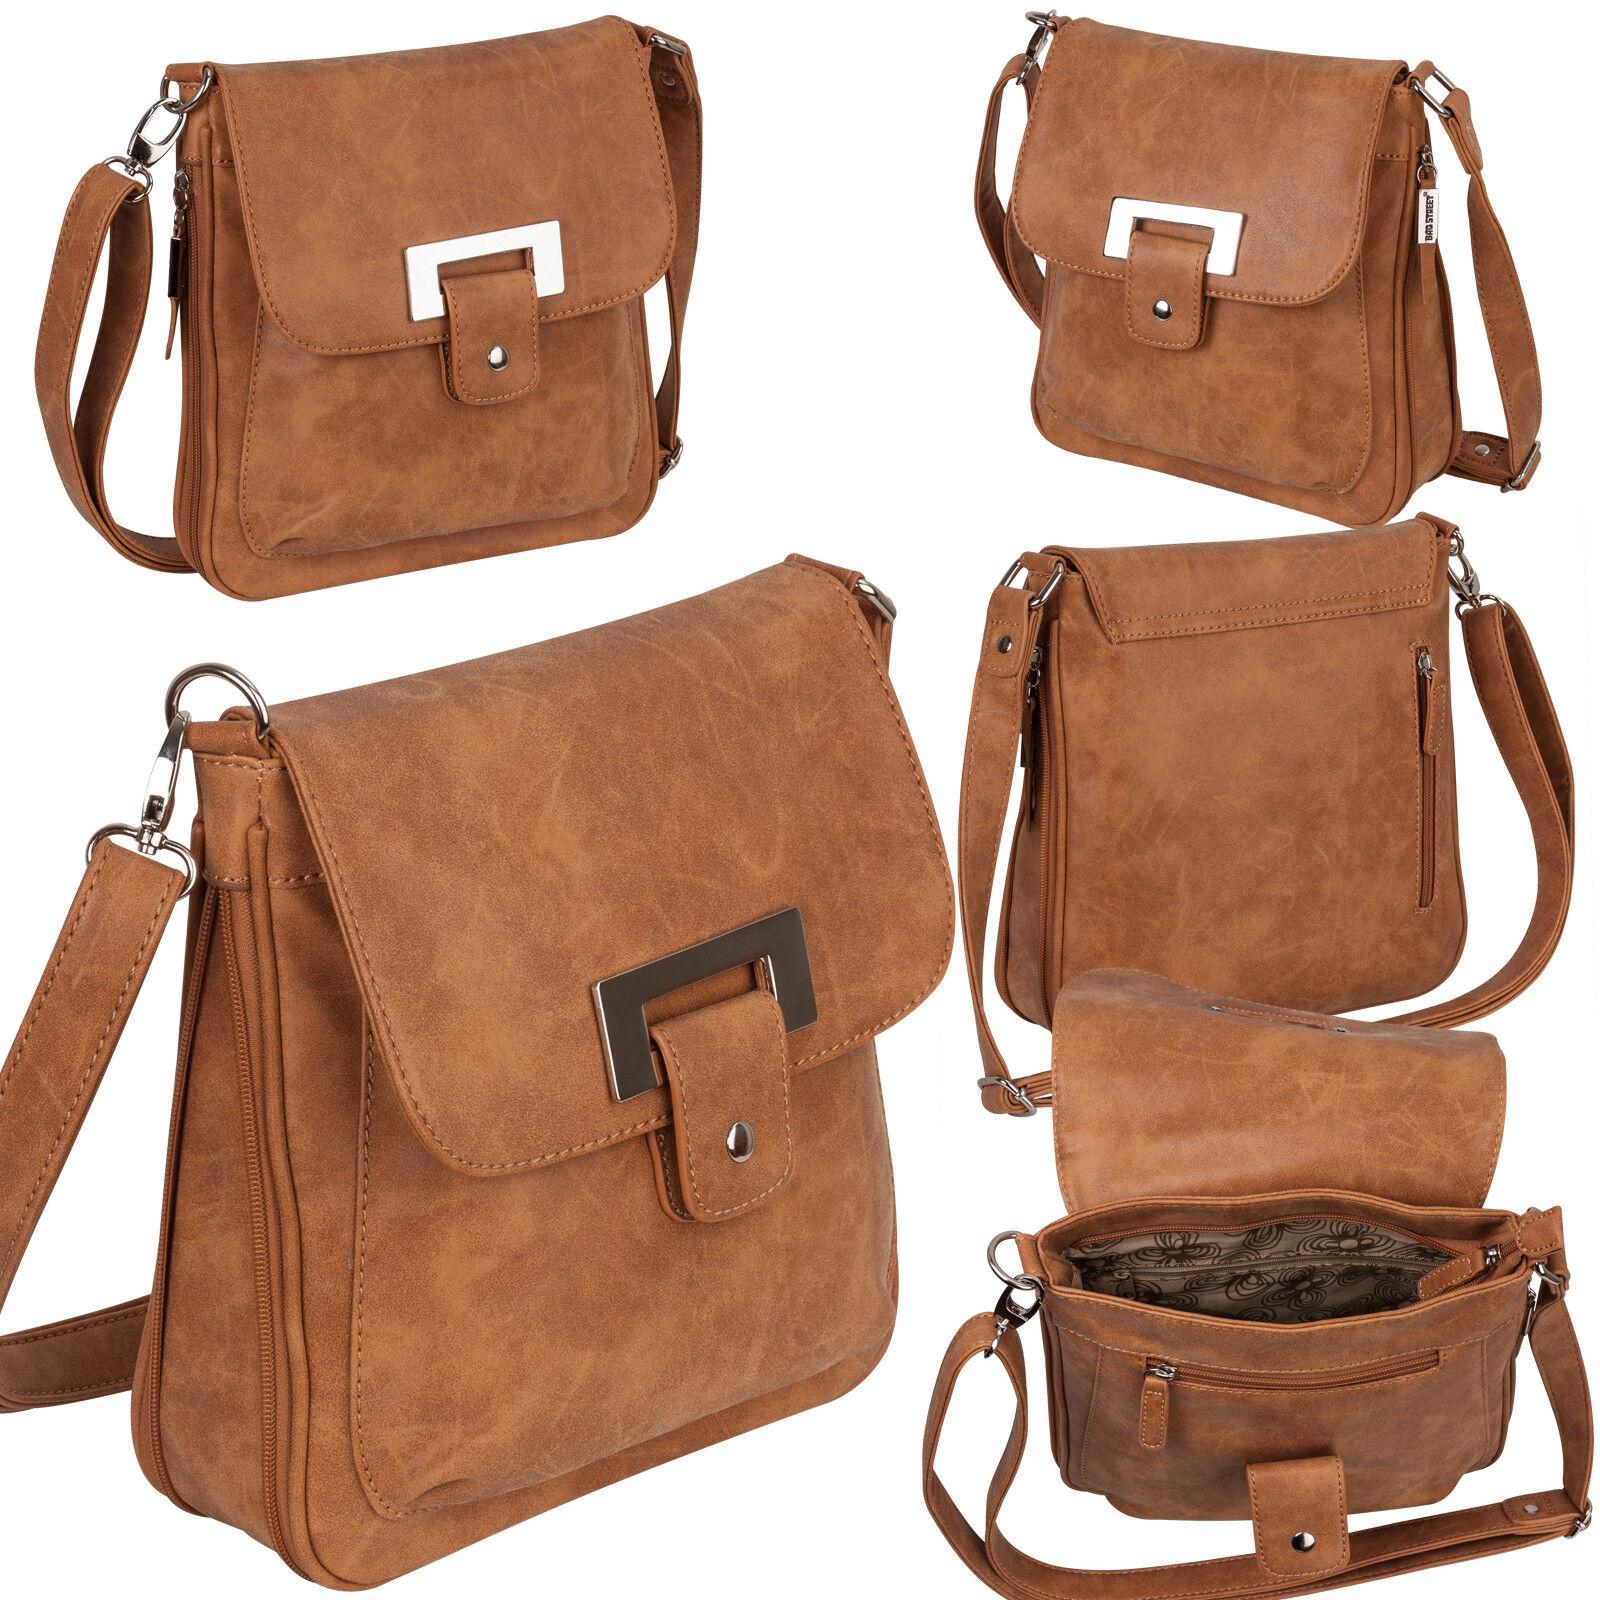 Bag Street Damentasche Umhängetasche Handtasche Schultertasche K2 T0101 Cognac